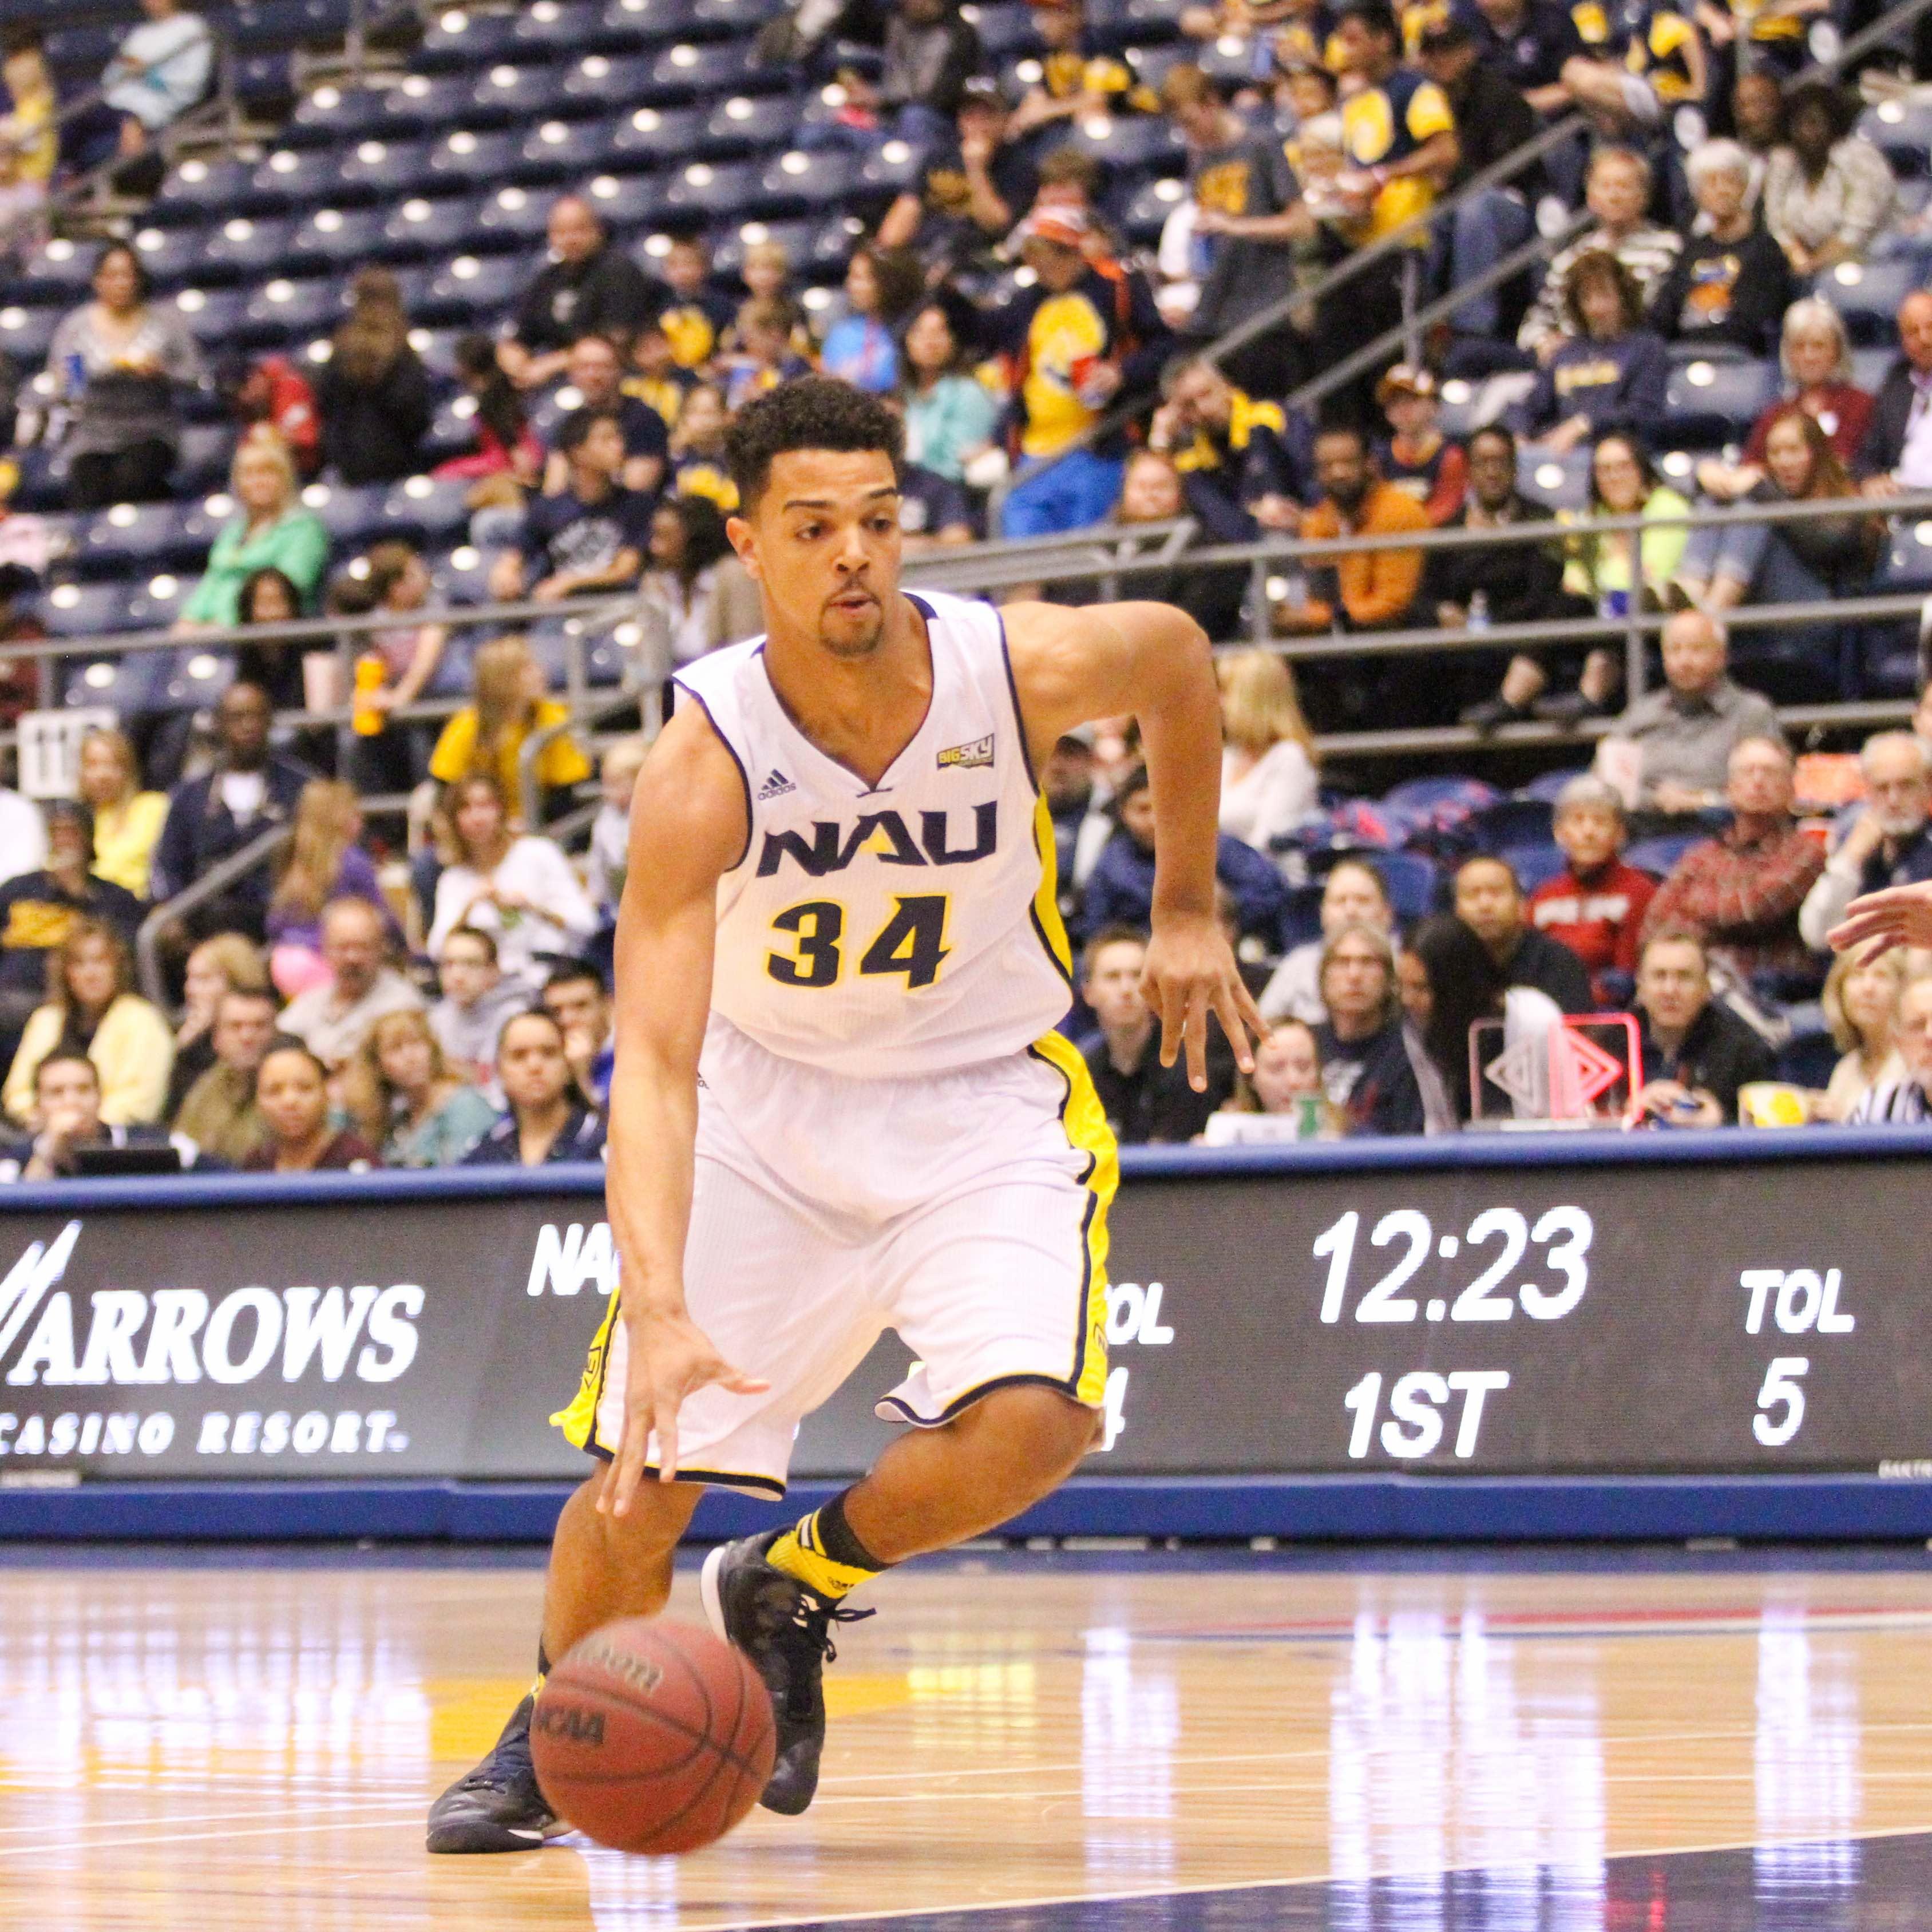 Men's Basketball takes it down court